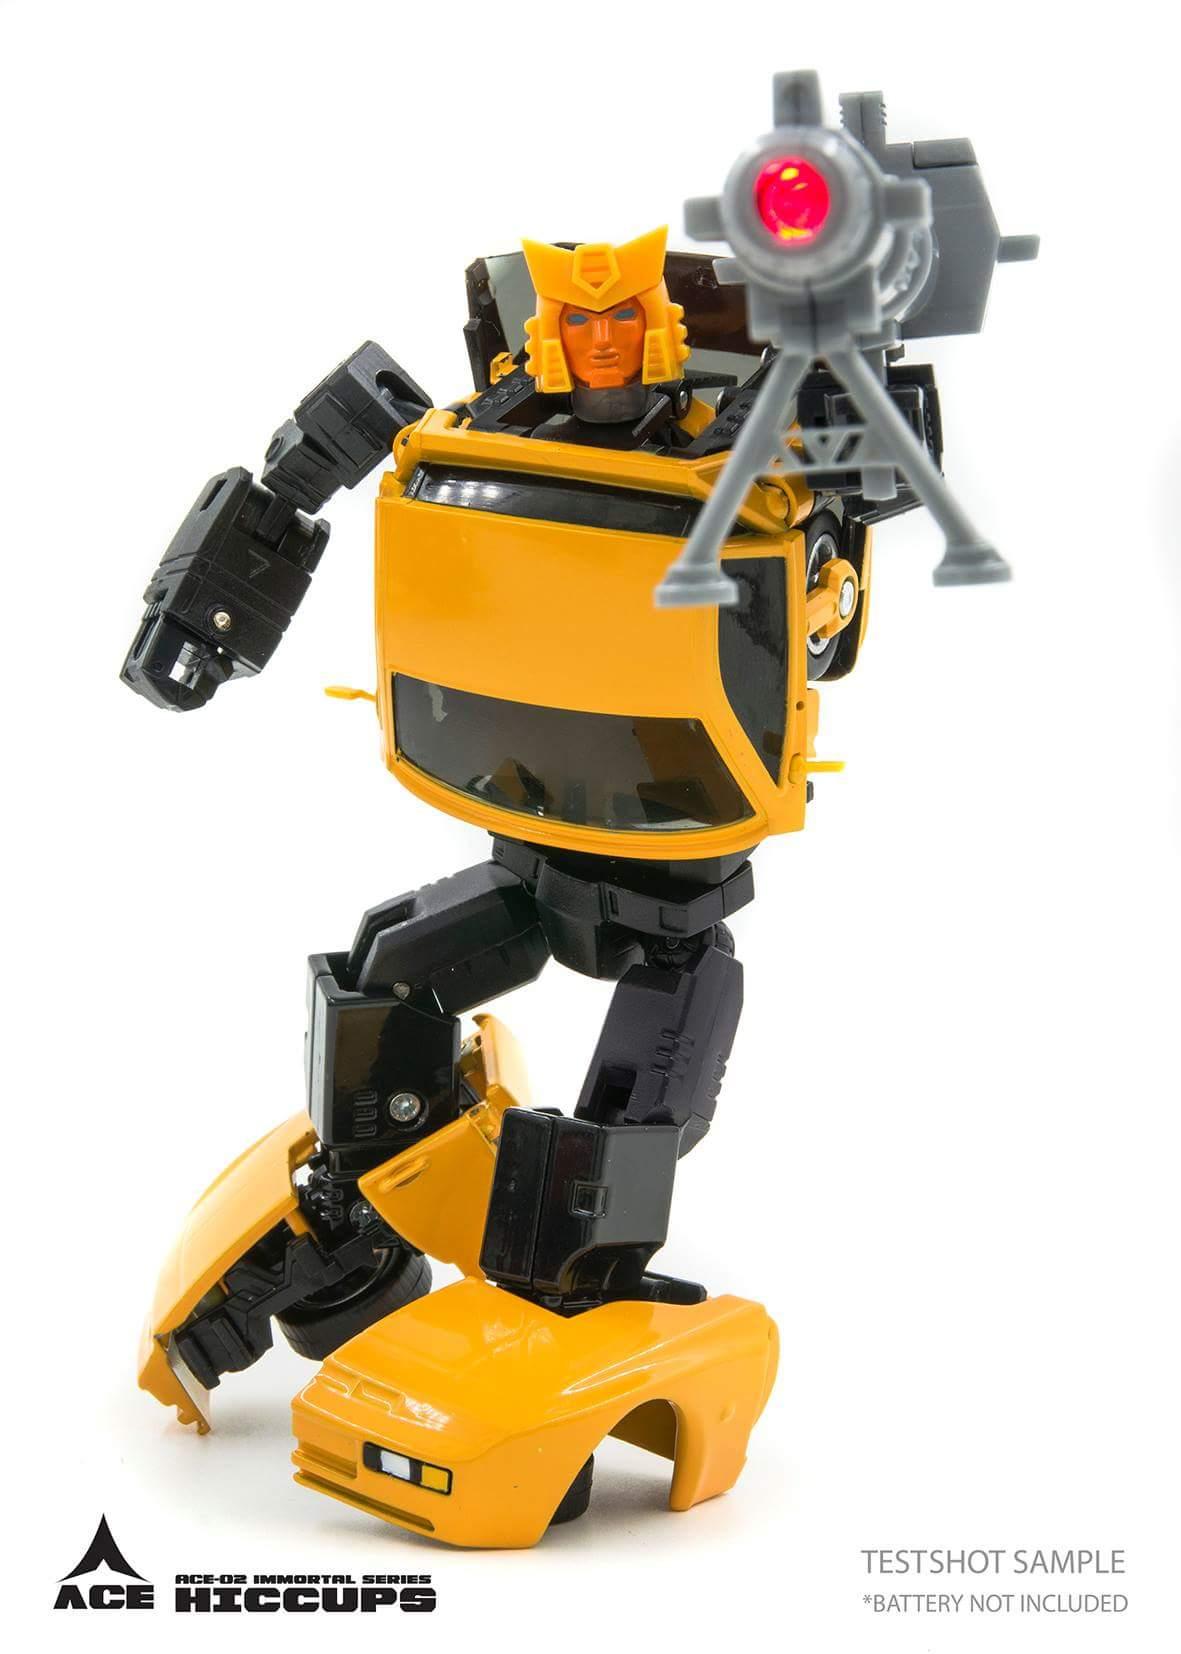 [ACE Collectables] Produit Tiers - Minibots MP - ACE-01 Tumbler (aka Cliffjumper/Matamore), ACE-02 Hiccups (aka Hubcap/Virevolto), ACE-03 Trident (aka Seaspray/Embruns) Aebj0E7s